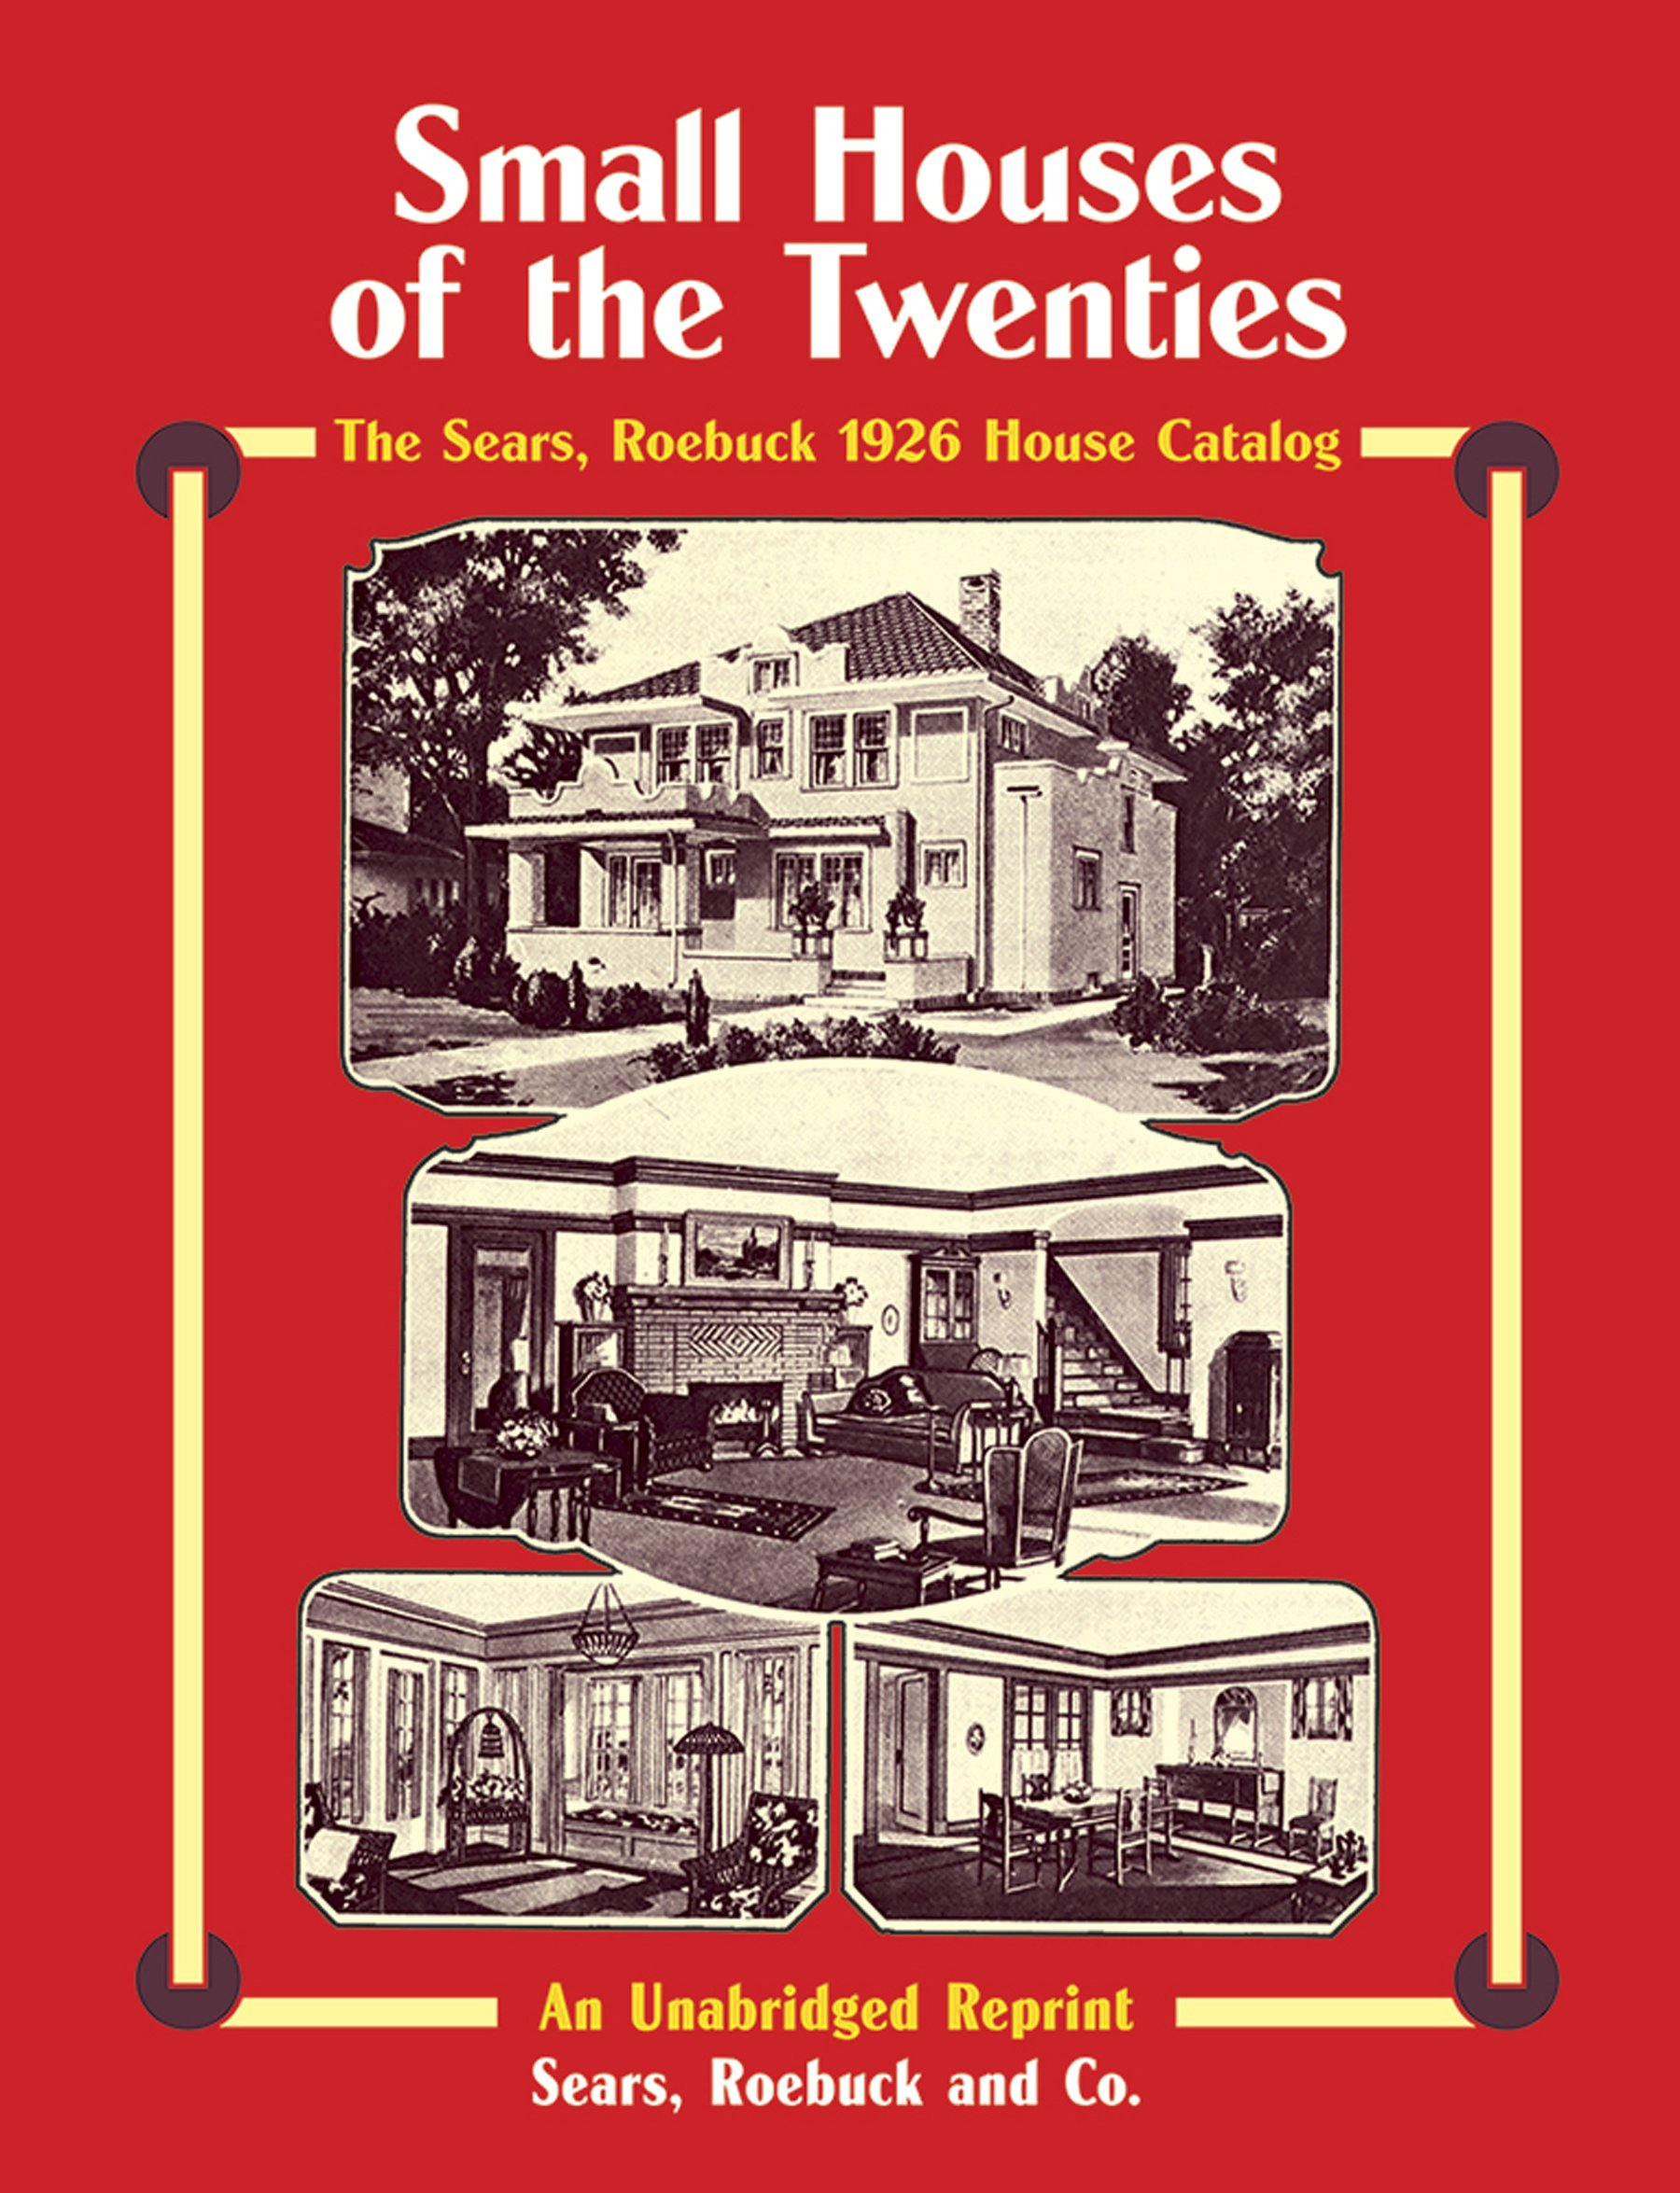 Sears, Roebuck Catalog of Houses, 1926: Small Houses of the Twenties ...